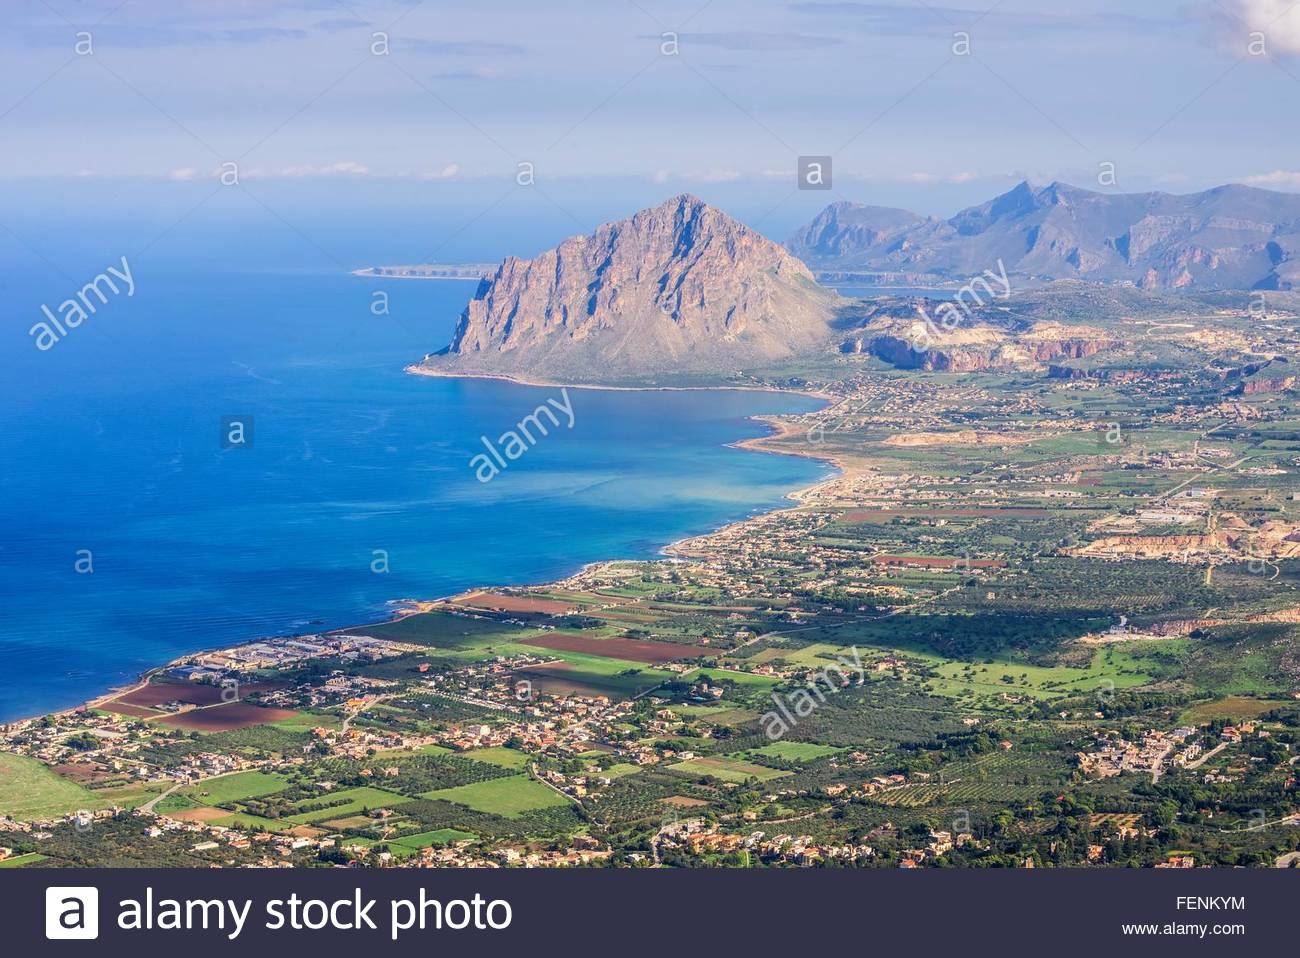 High angle view of Monte Cofano and coastline, Erice, Sicily, Italy - Stock Image